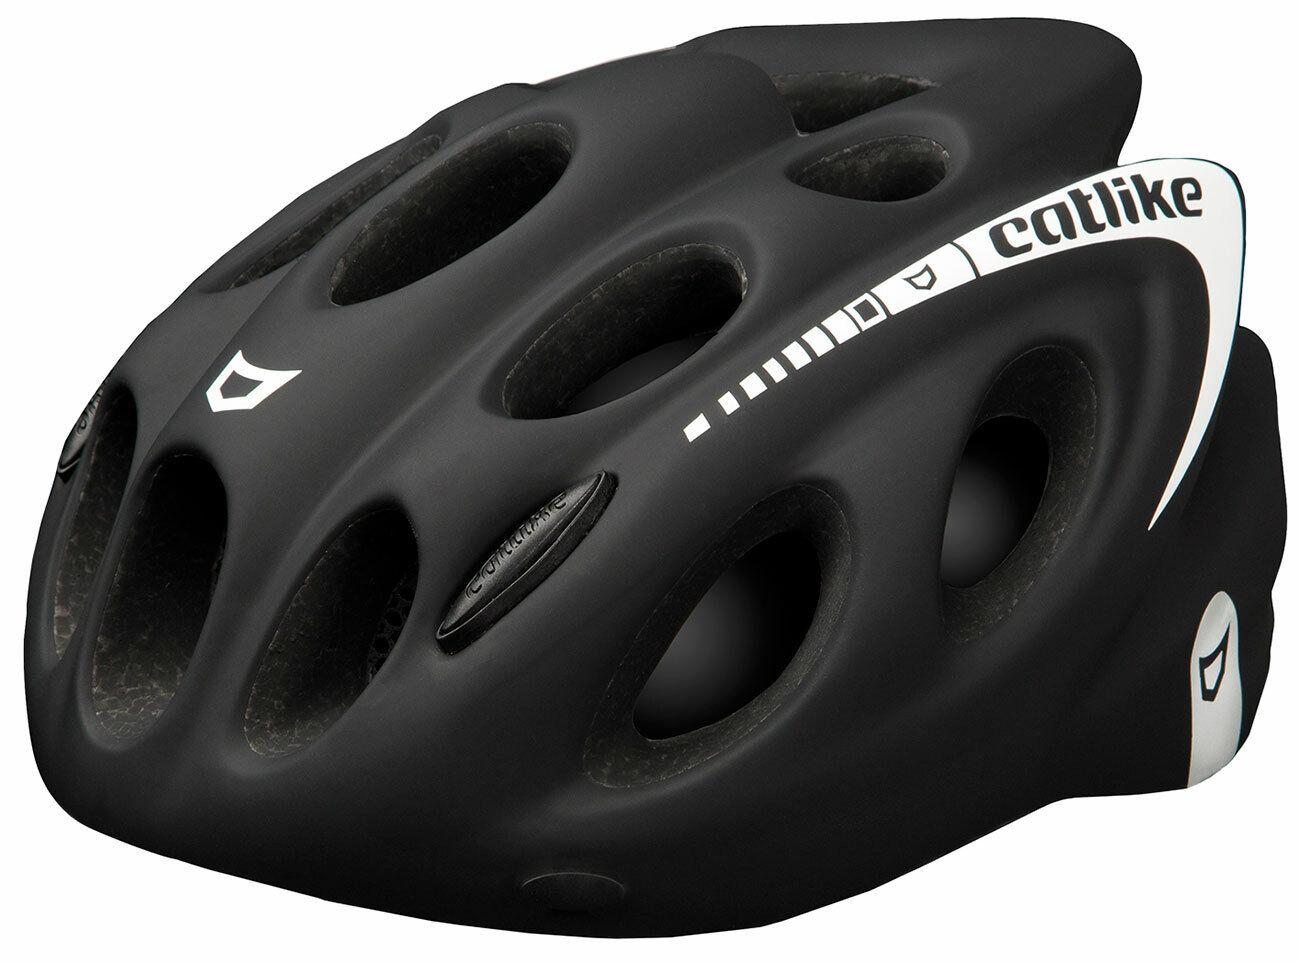 Catlike Kompact/'O Bike Helmet Large 59-61cm Brown//Orange 2133000LGCV